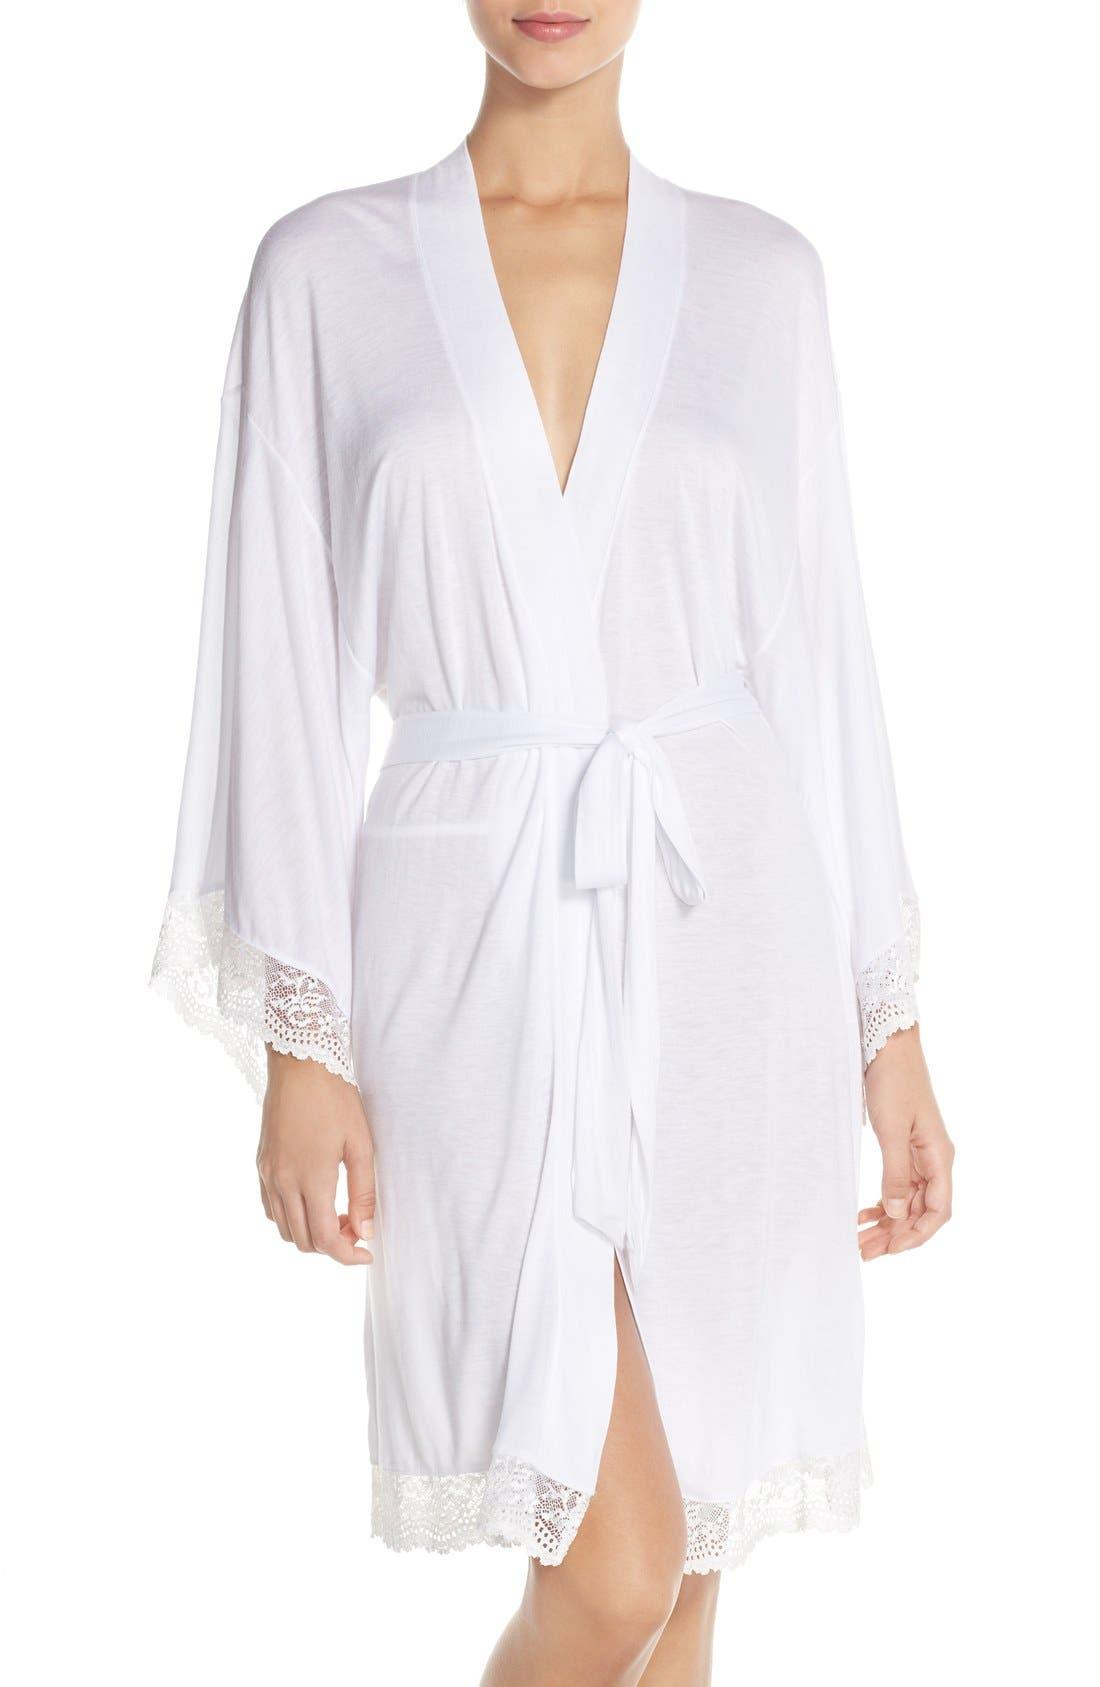 Eberjey 'Colette' Kimono Robe